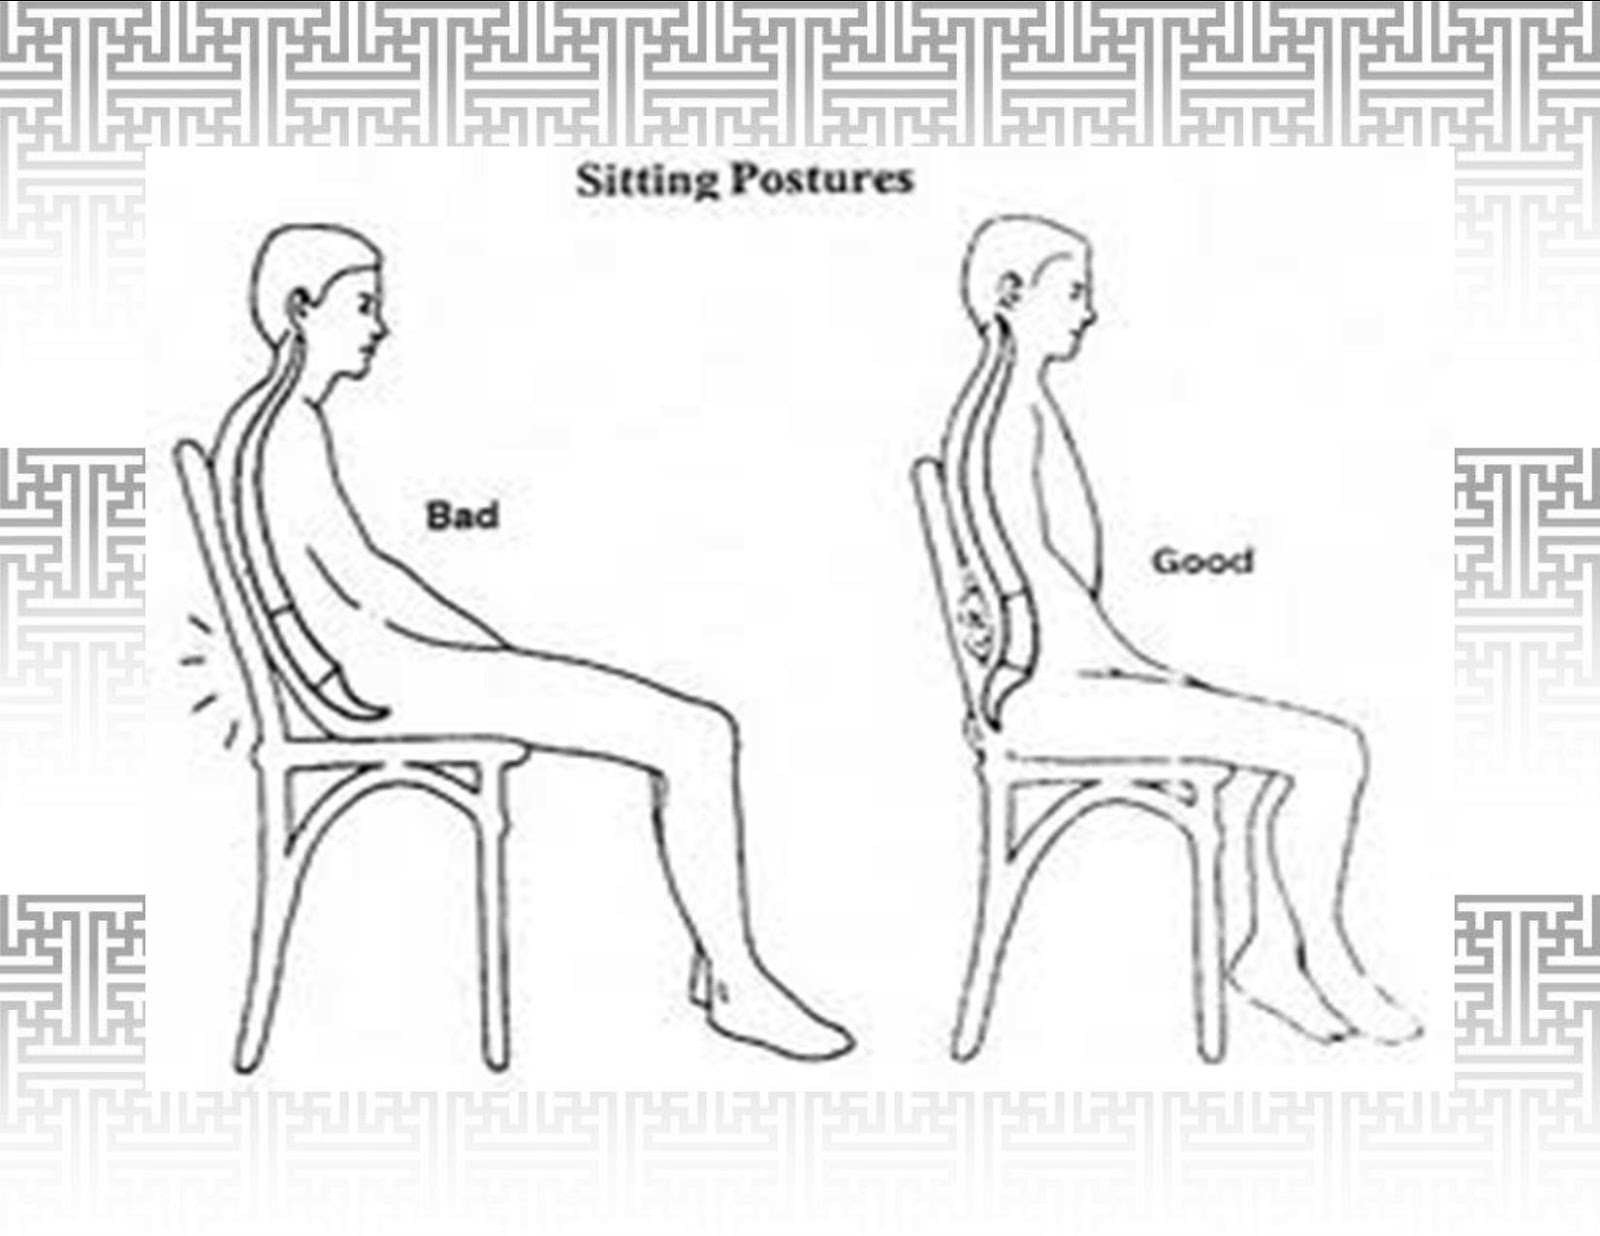 Chair Posture Back Pain Baby High Wooden Wellscript Llc 11 Great Benefits Of Having Good